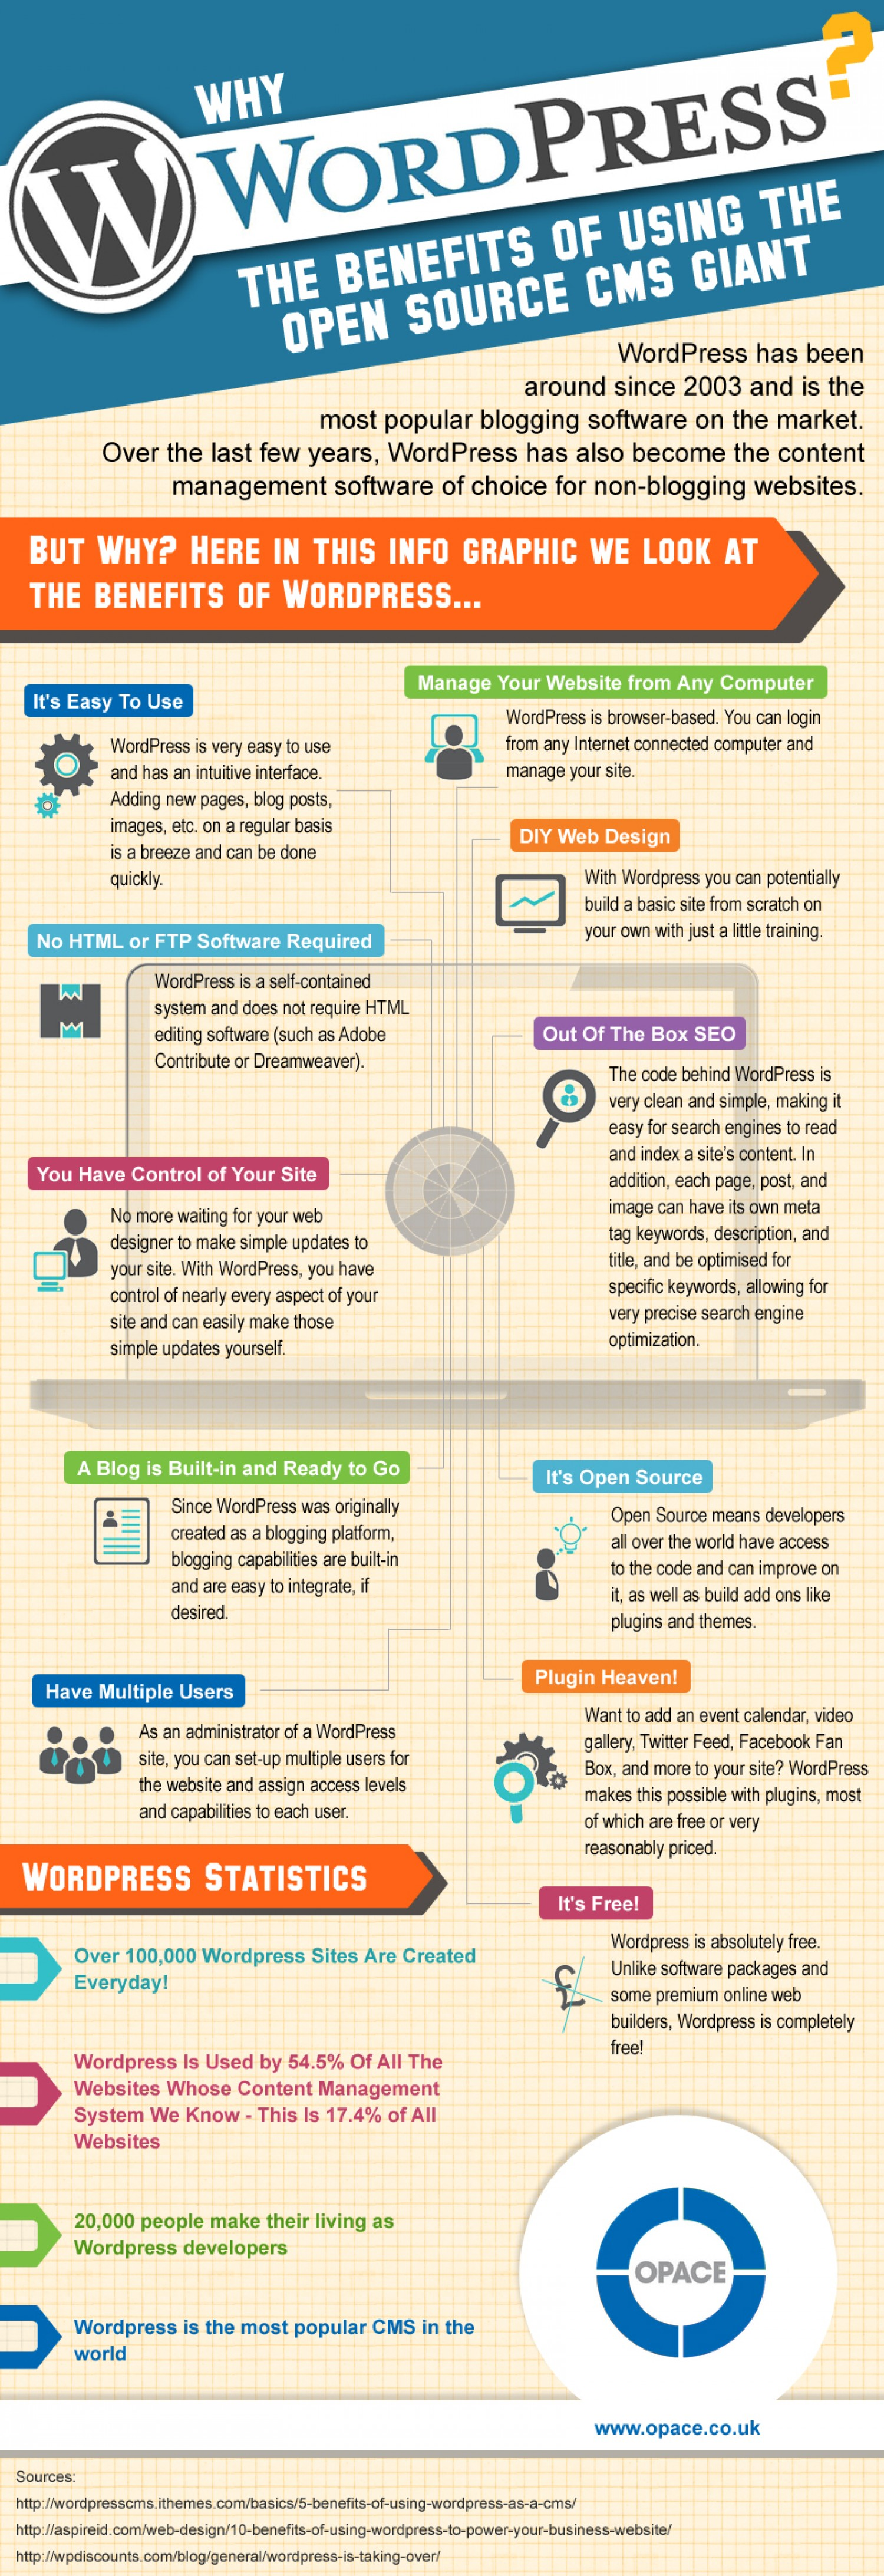 why wordpress? the benefits